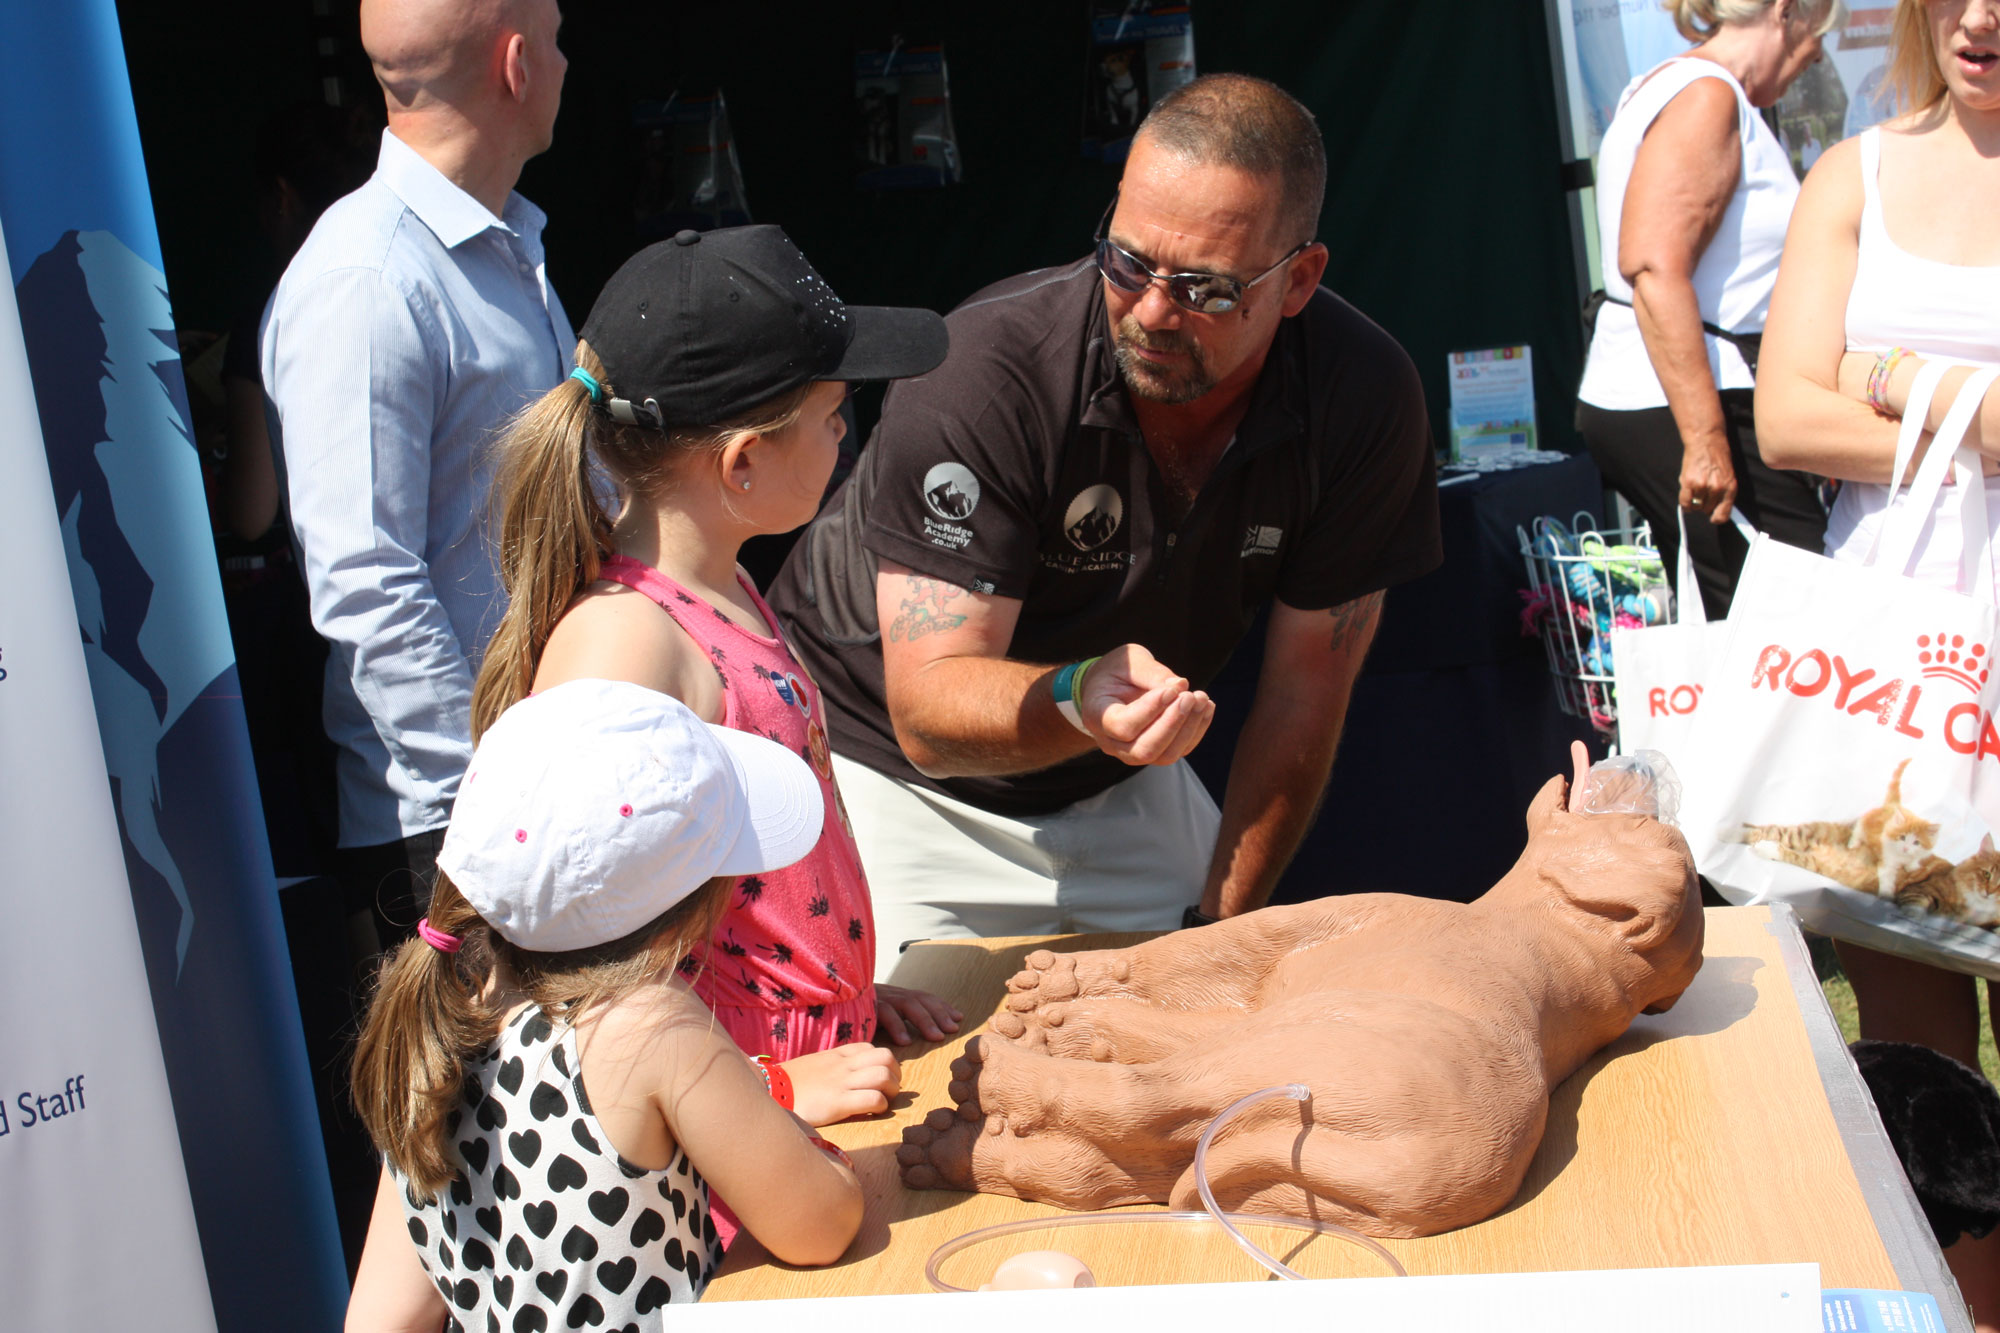 K9 CPR Demonstration